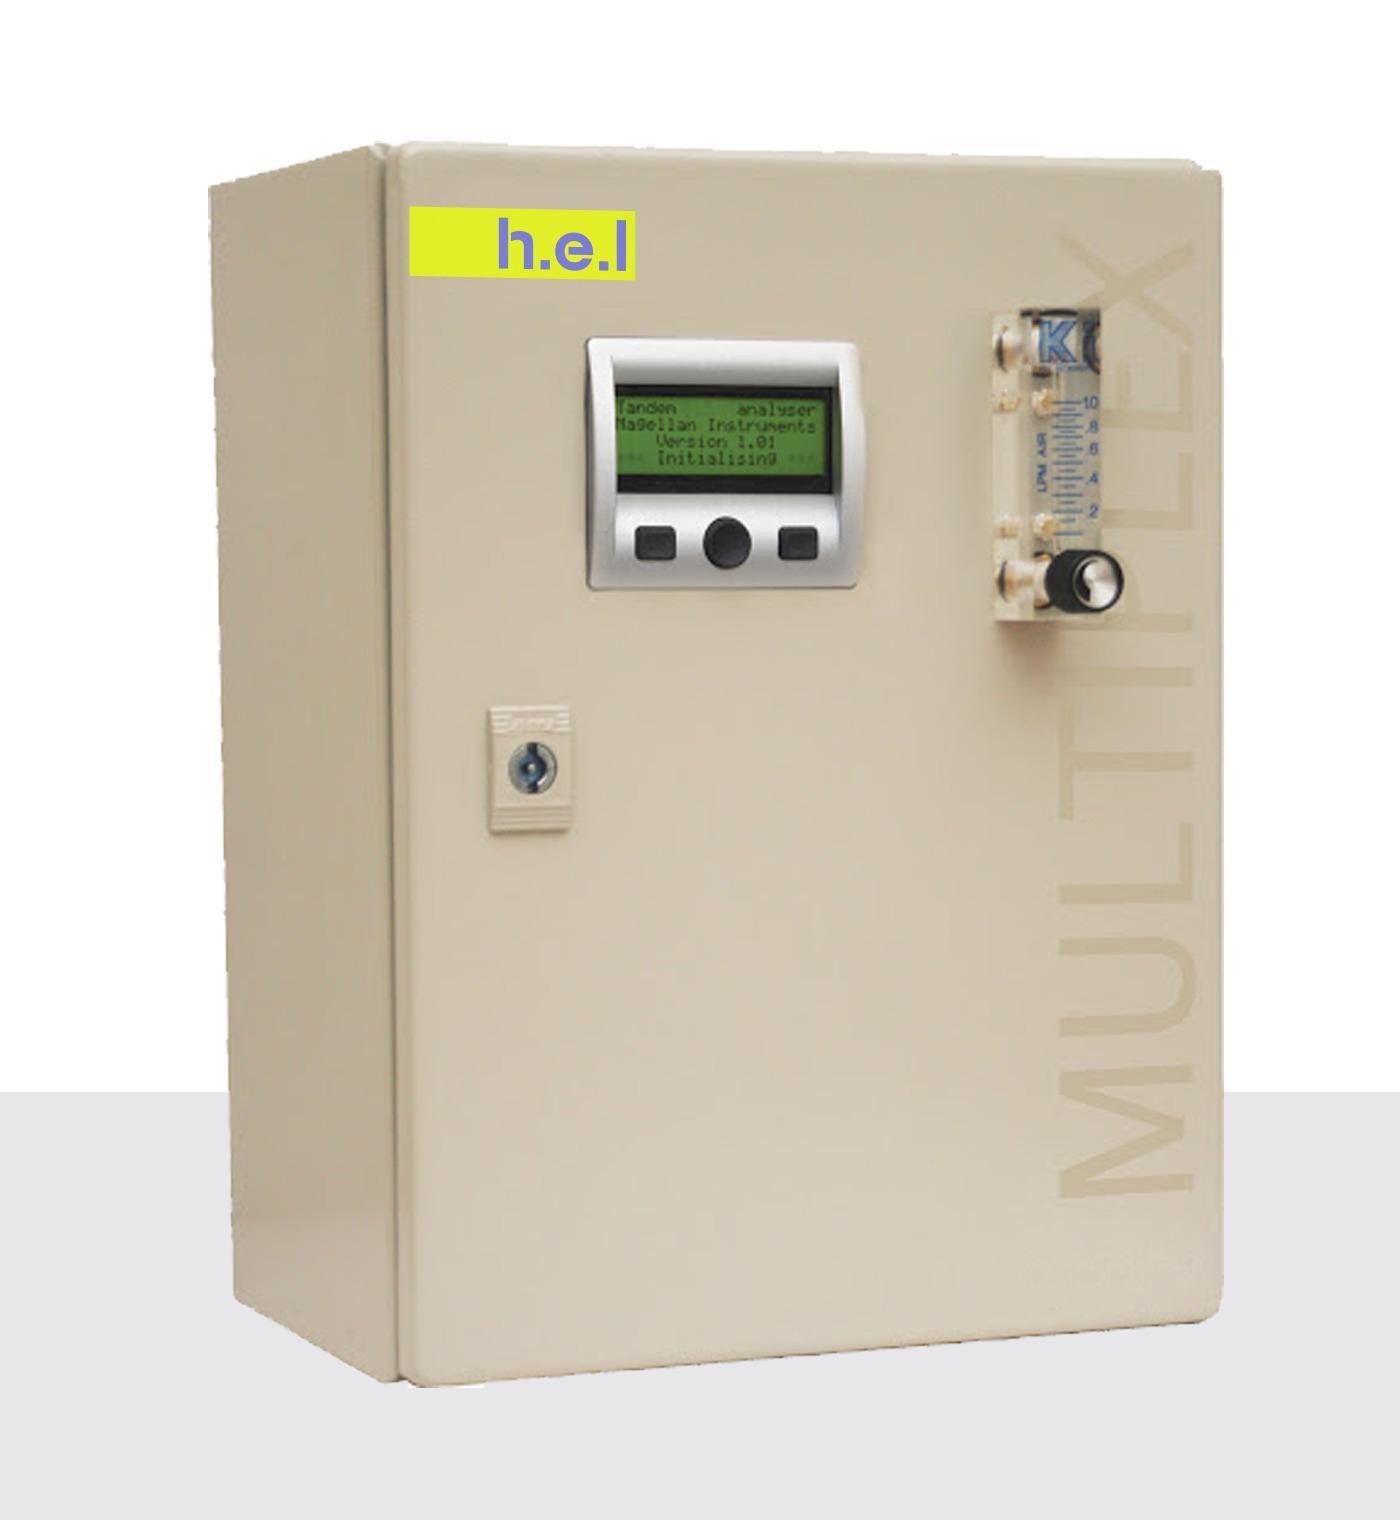 Tandem MULTI: A Multi-Line Off-Gas Analyzer